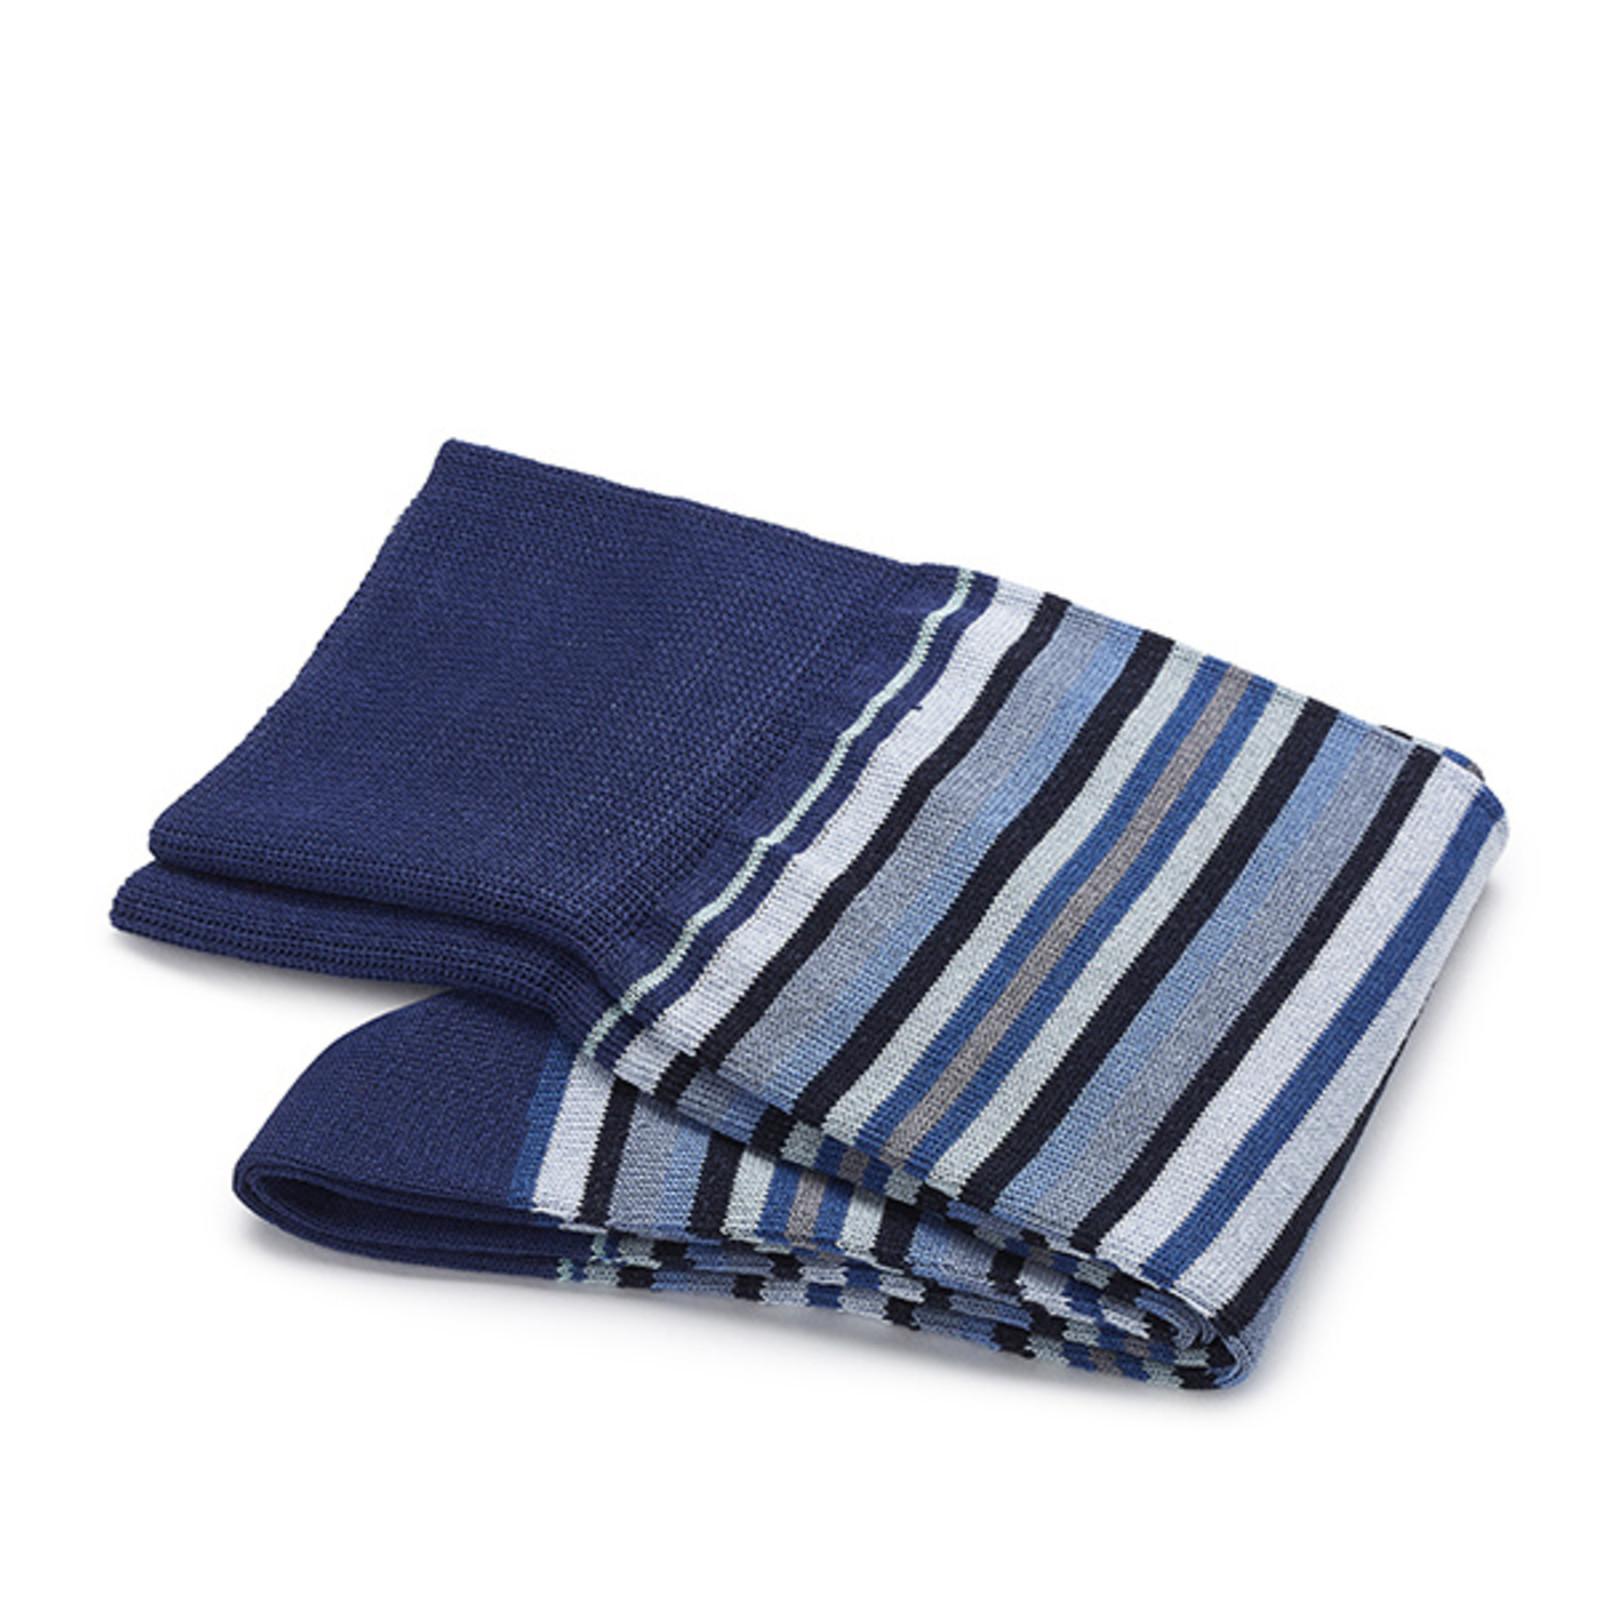 Carlo Lanza Blauwe streep sokken | Carlo Lanza